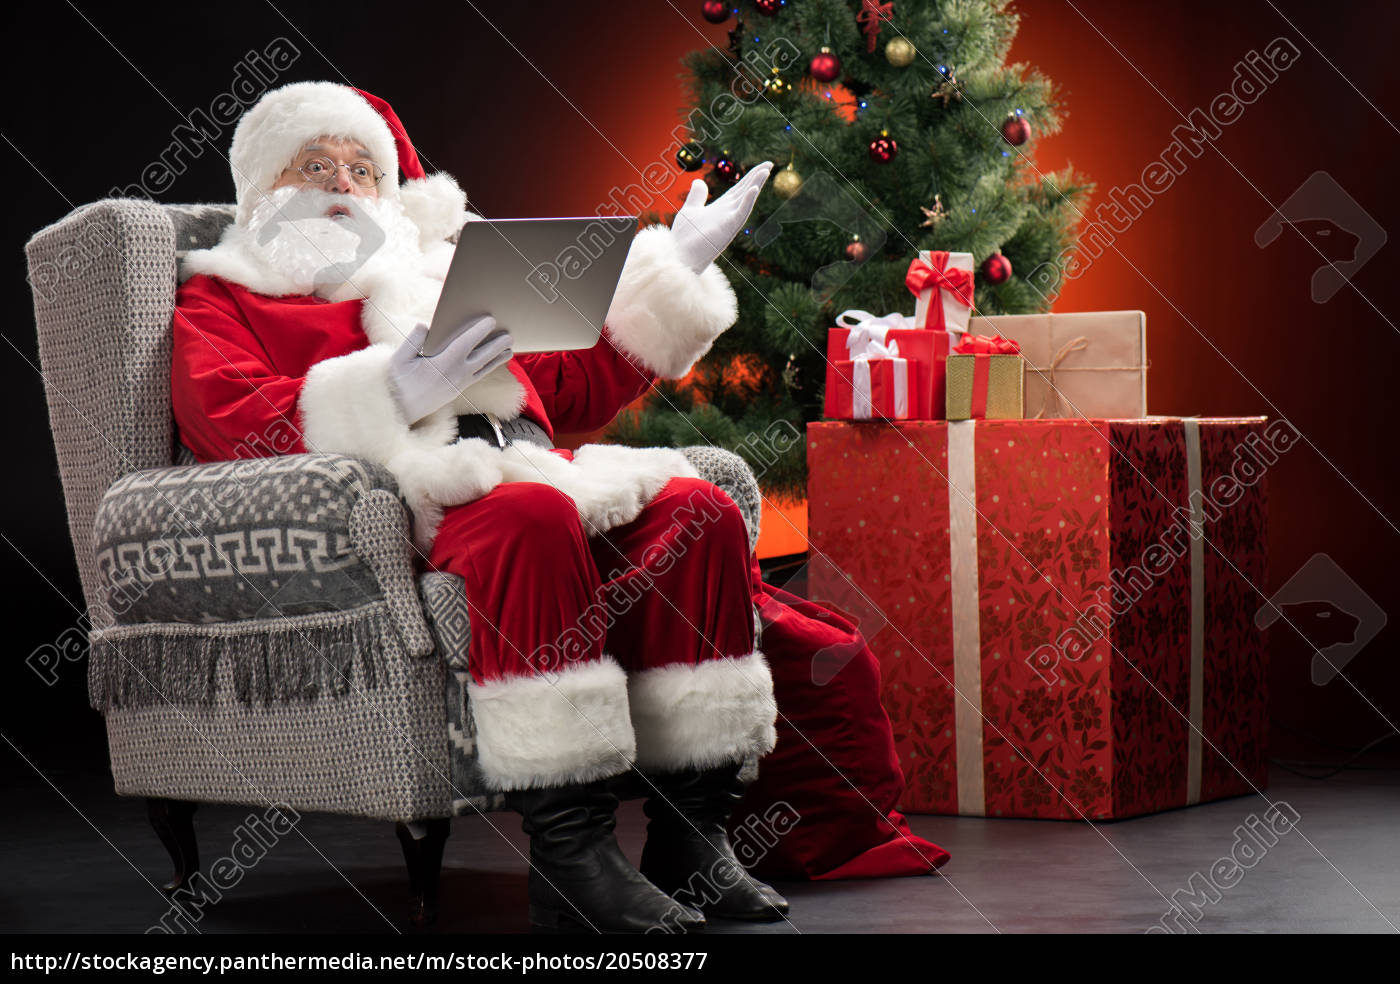 santa, claus, using, laptop, and, gesturing - 20508377